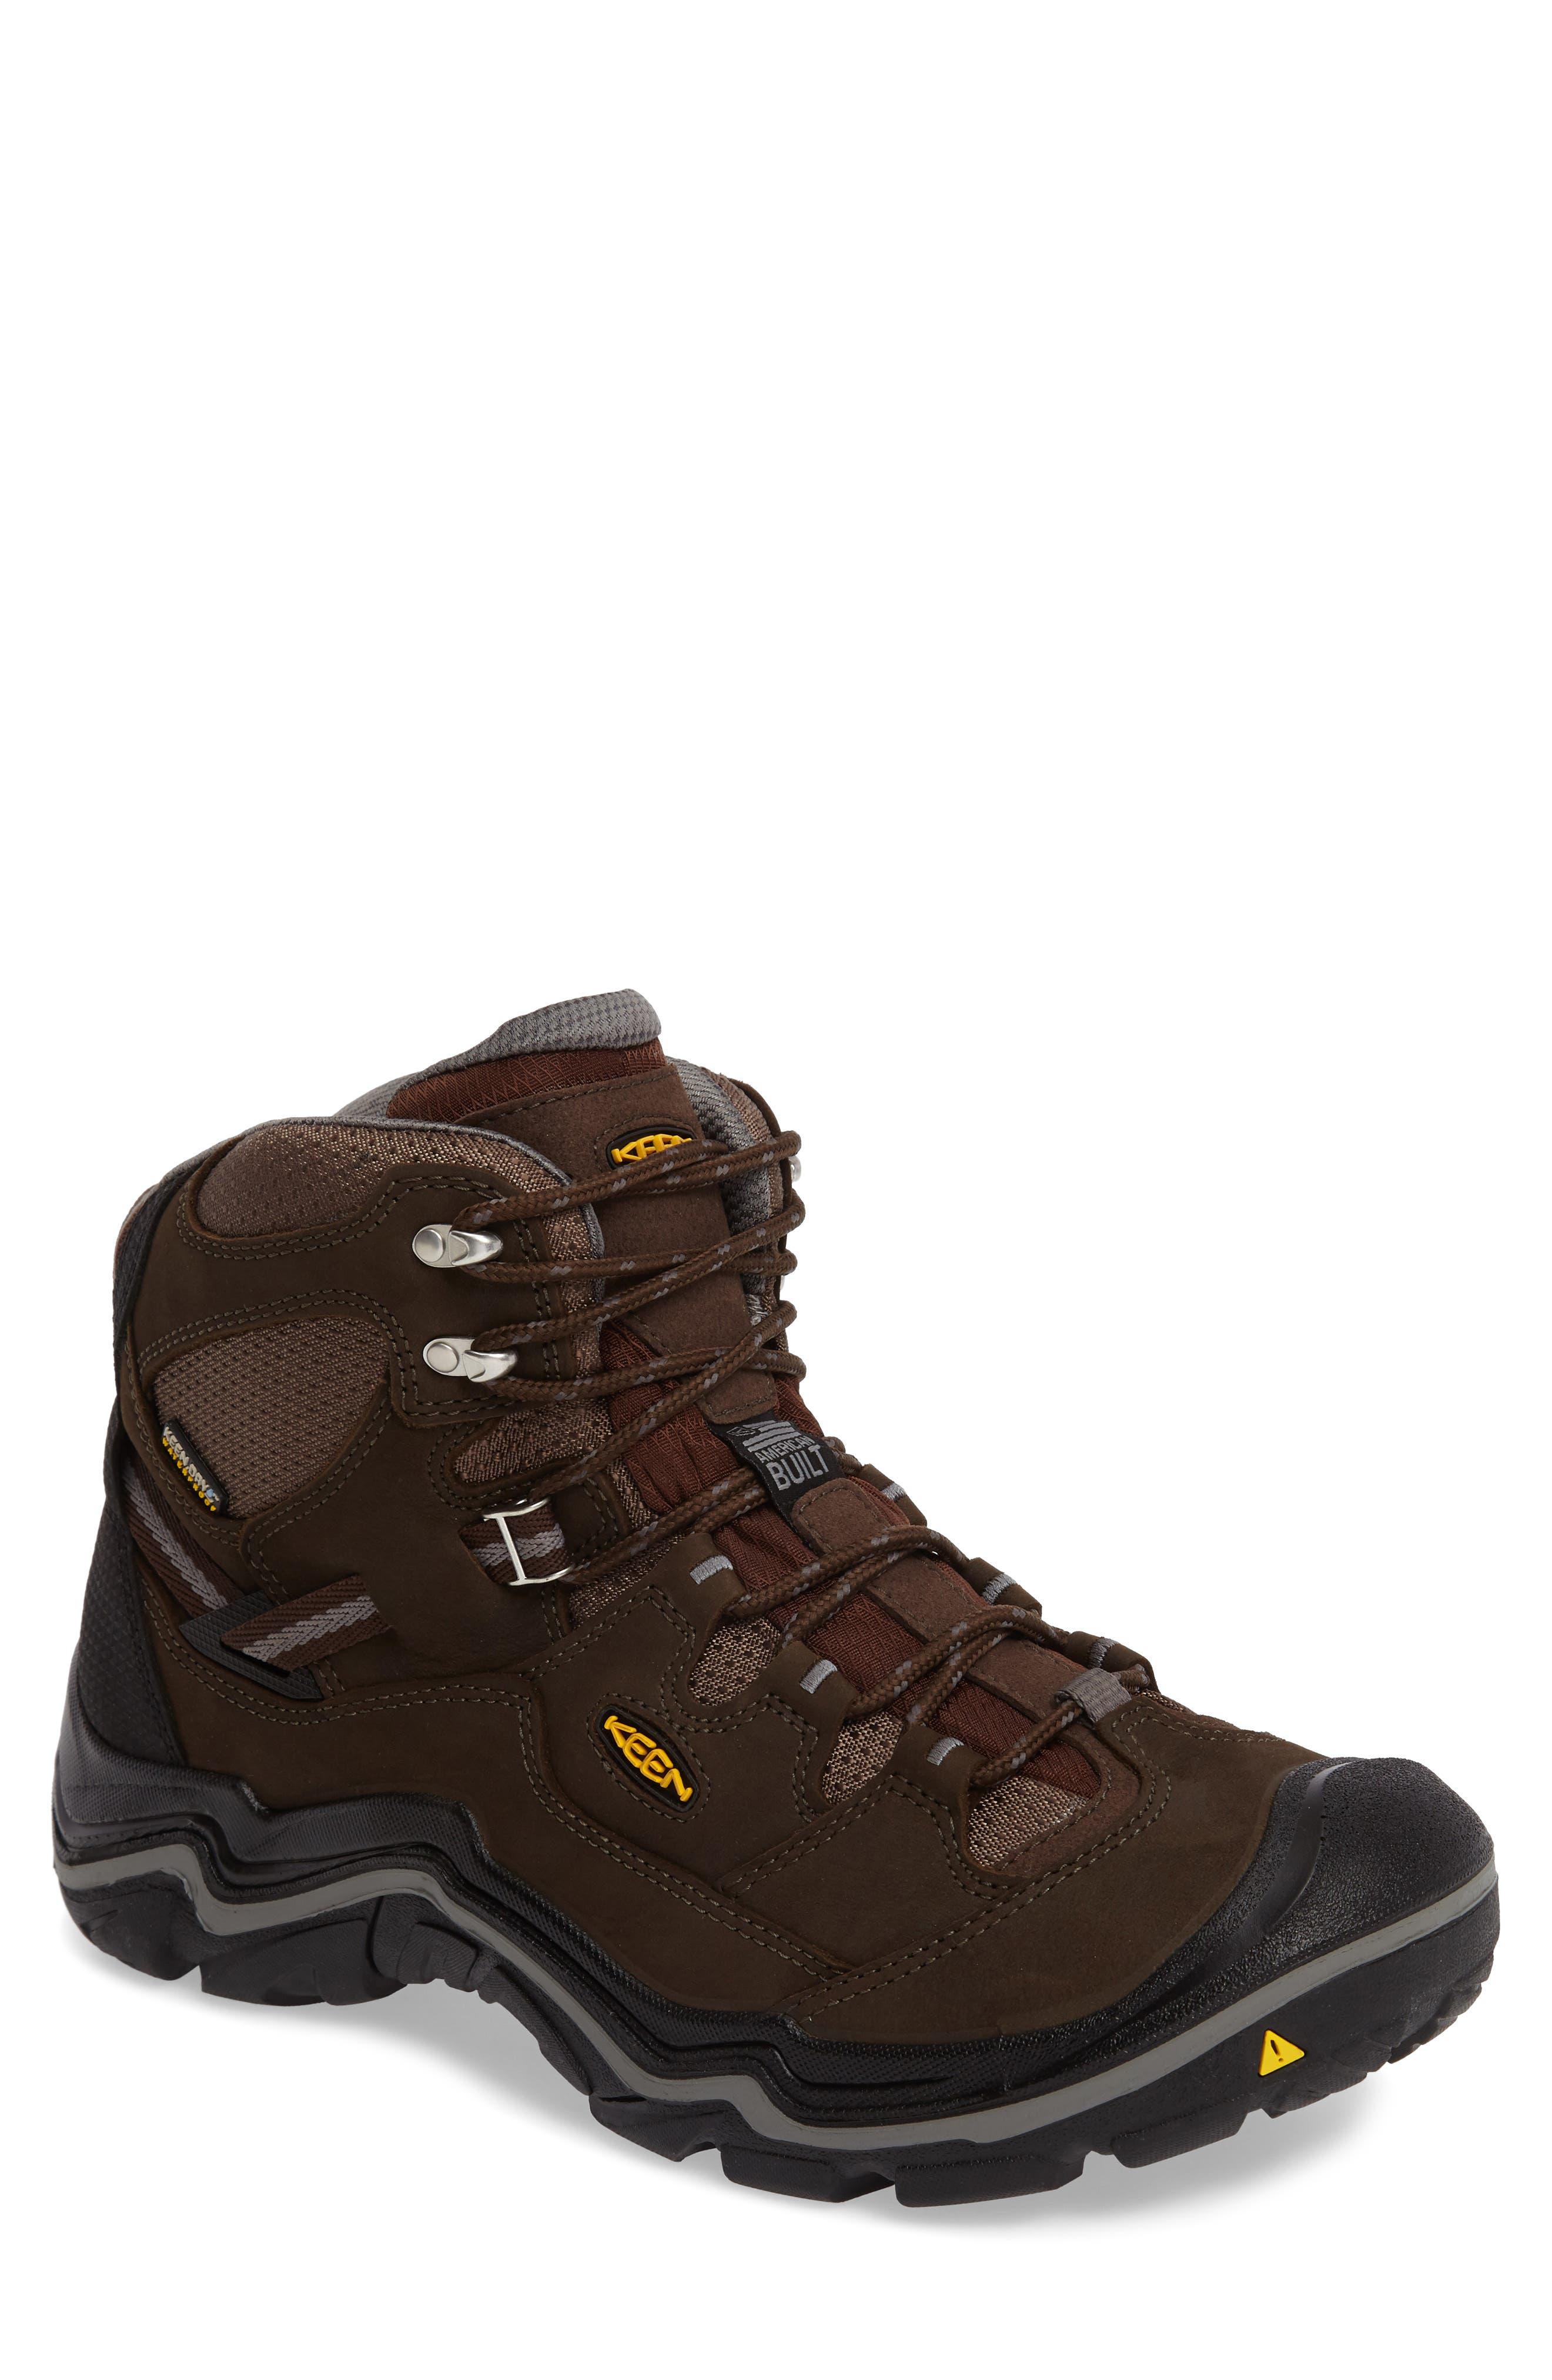 Alternate Image 1 Selected - Keen Durand Mid Waterproof Hiking Boot (Men)